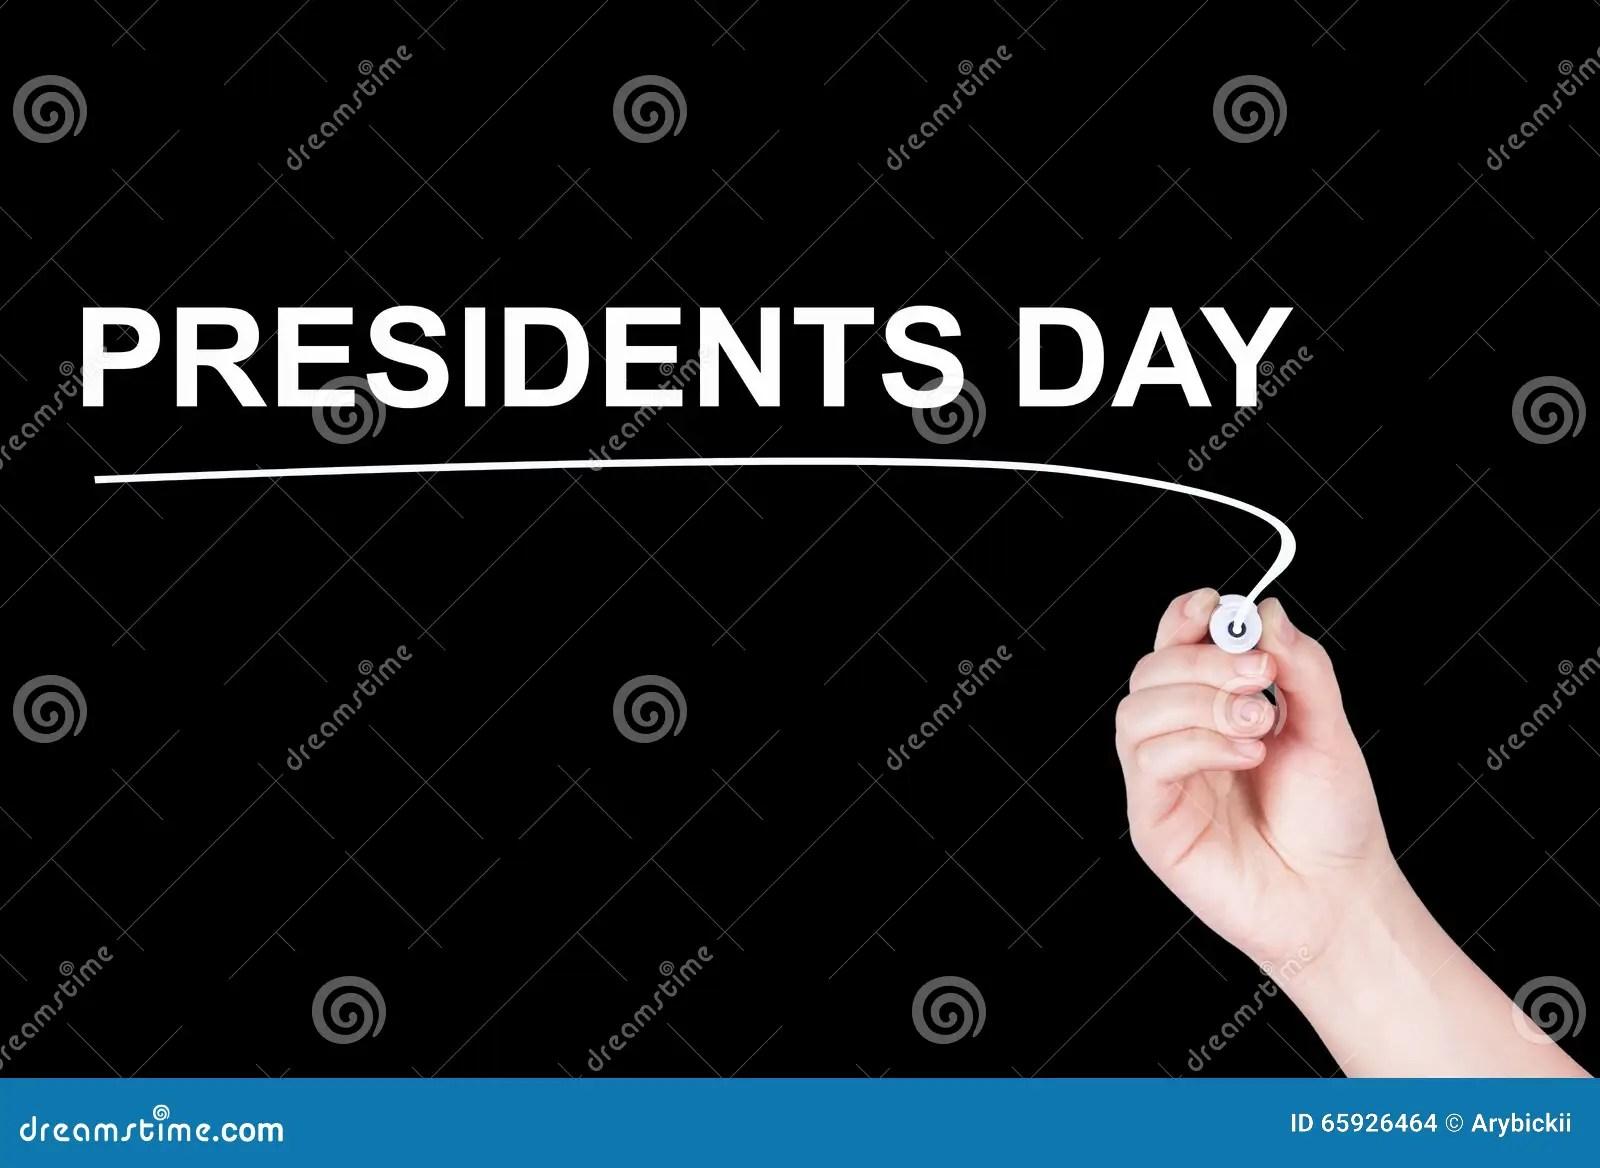 Presidents Day Word Written Stock Photo